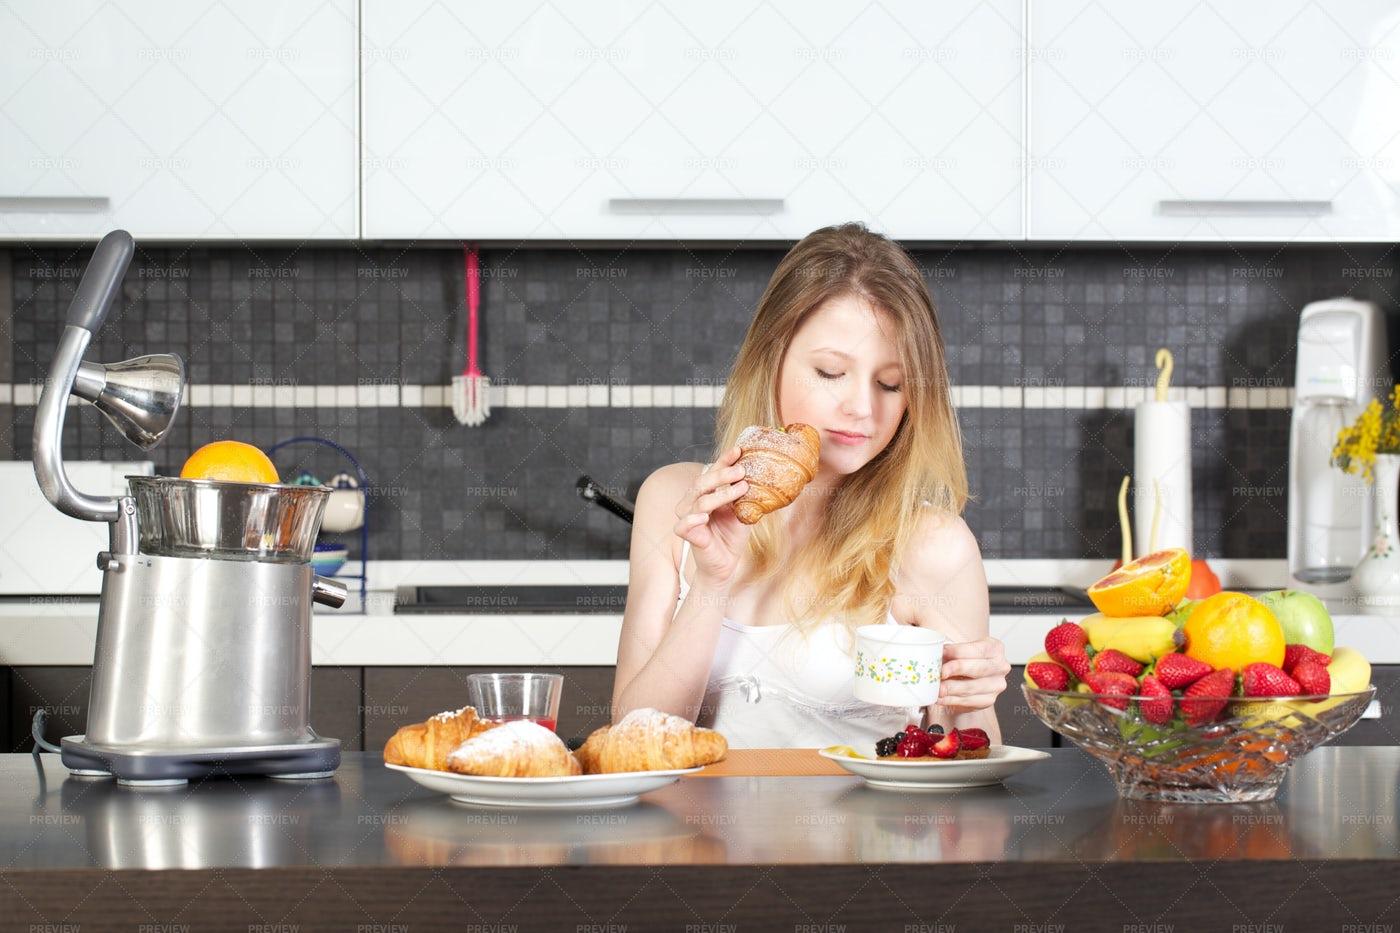 Woman Having Breakfast At Home: Stock Photos